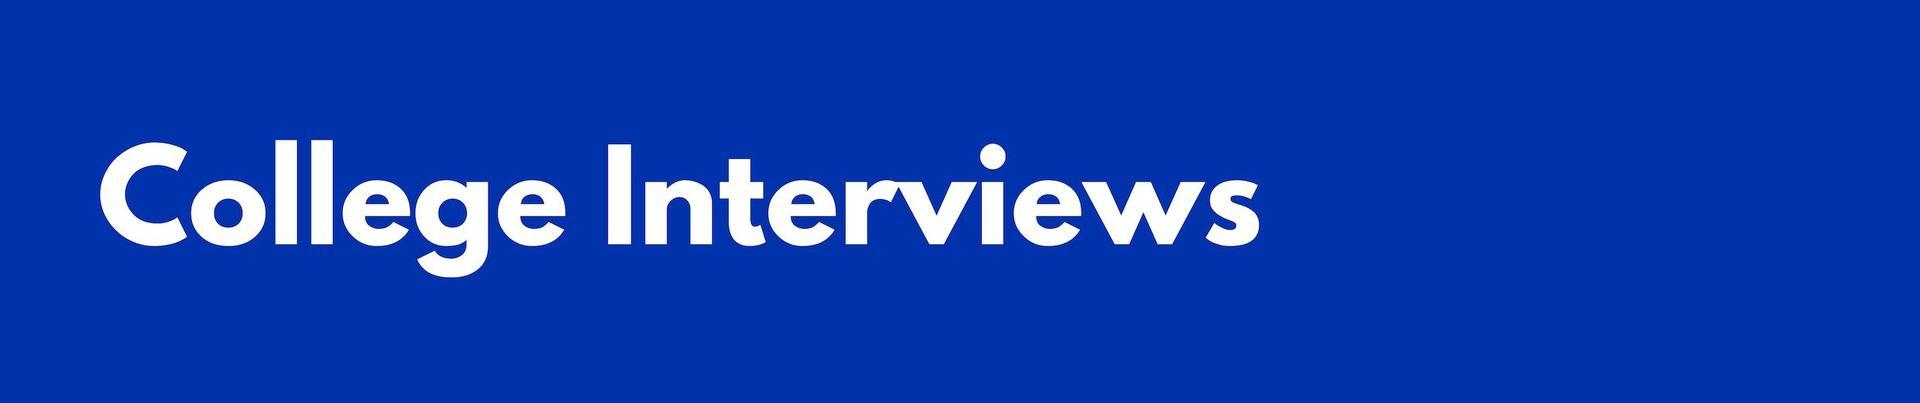 College Interview Headers